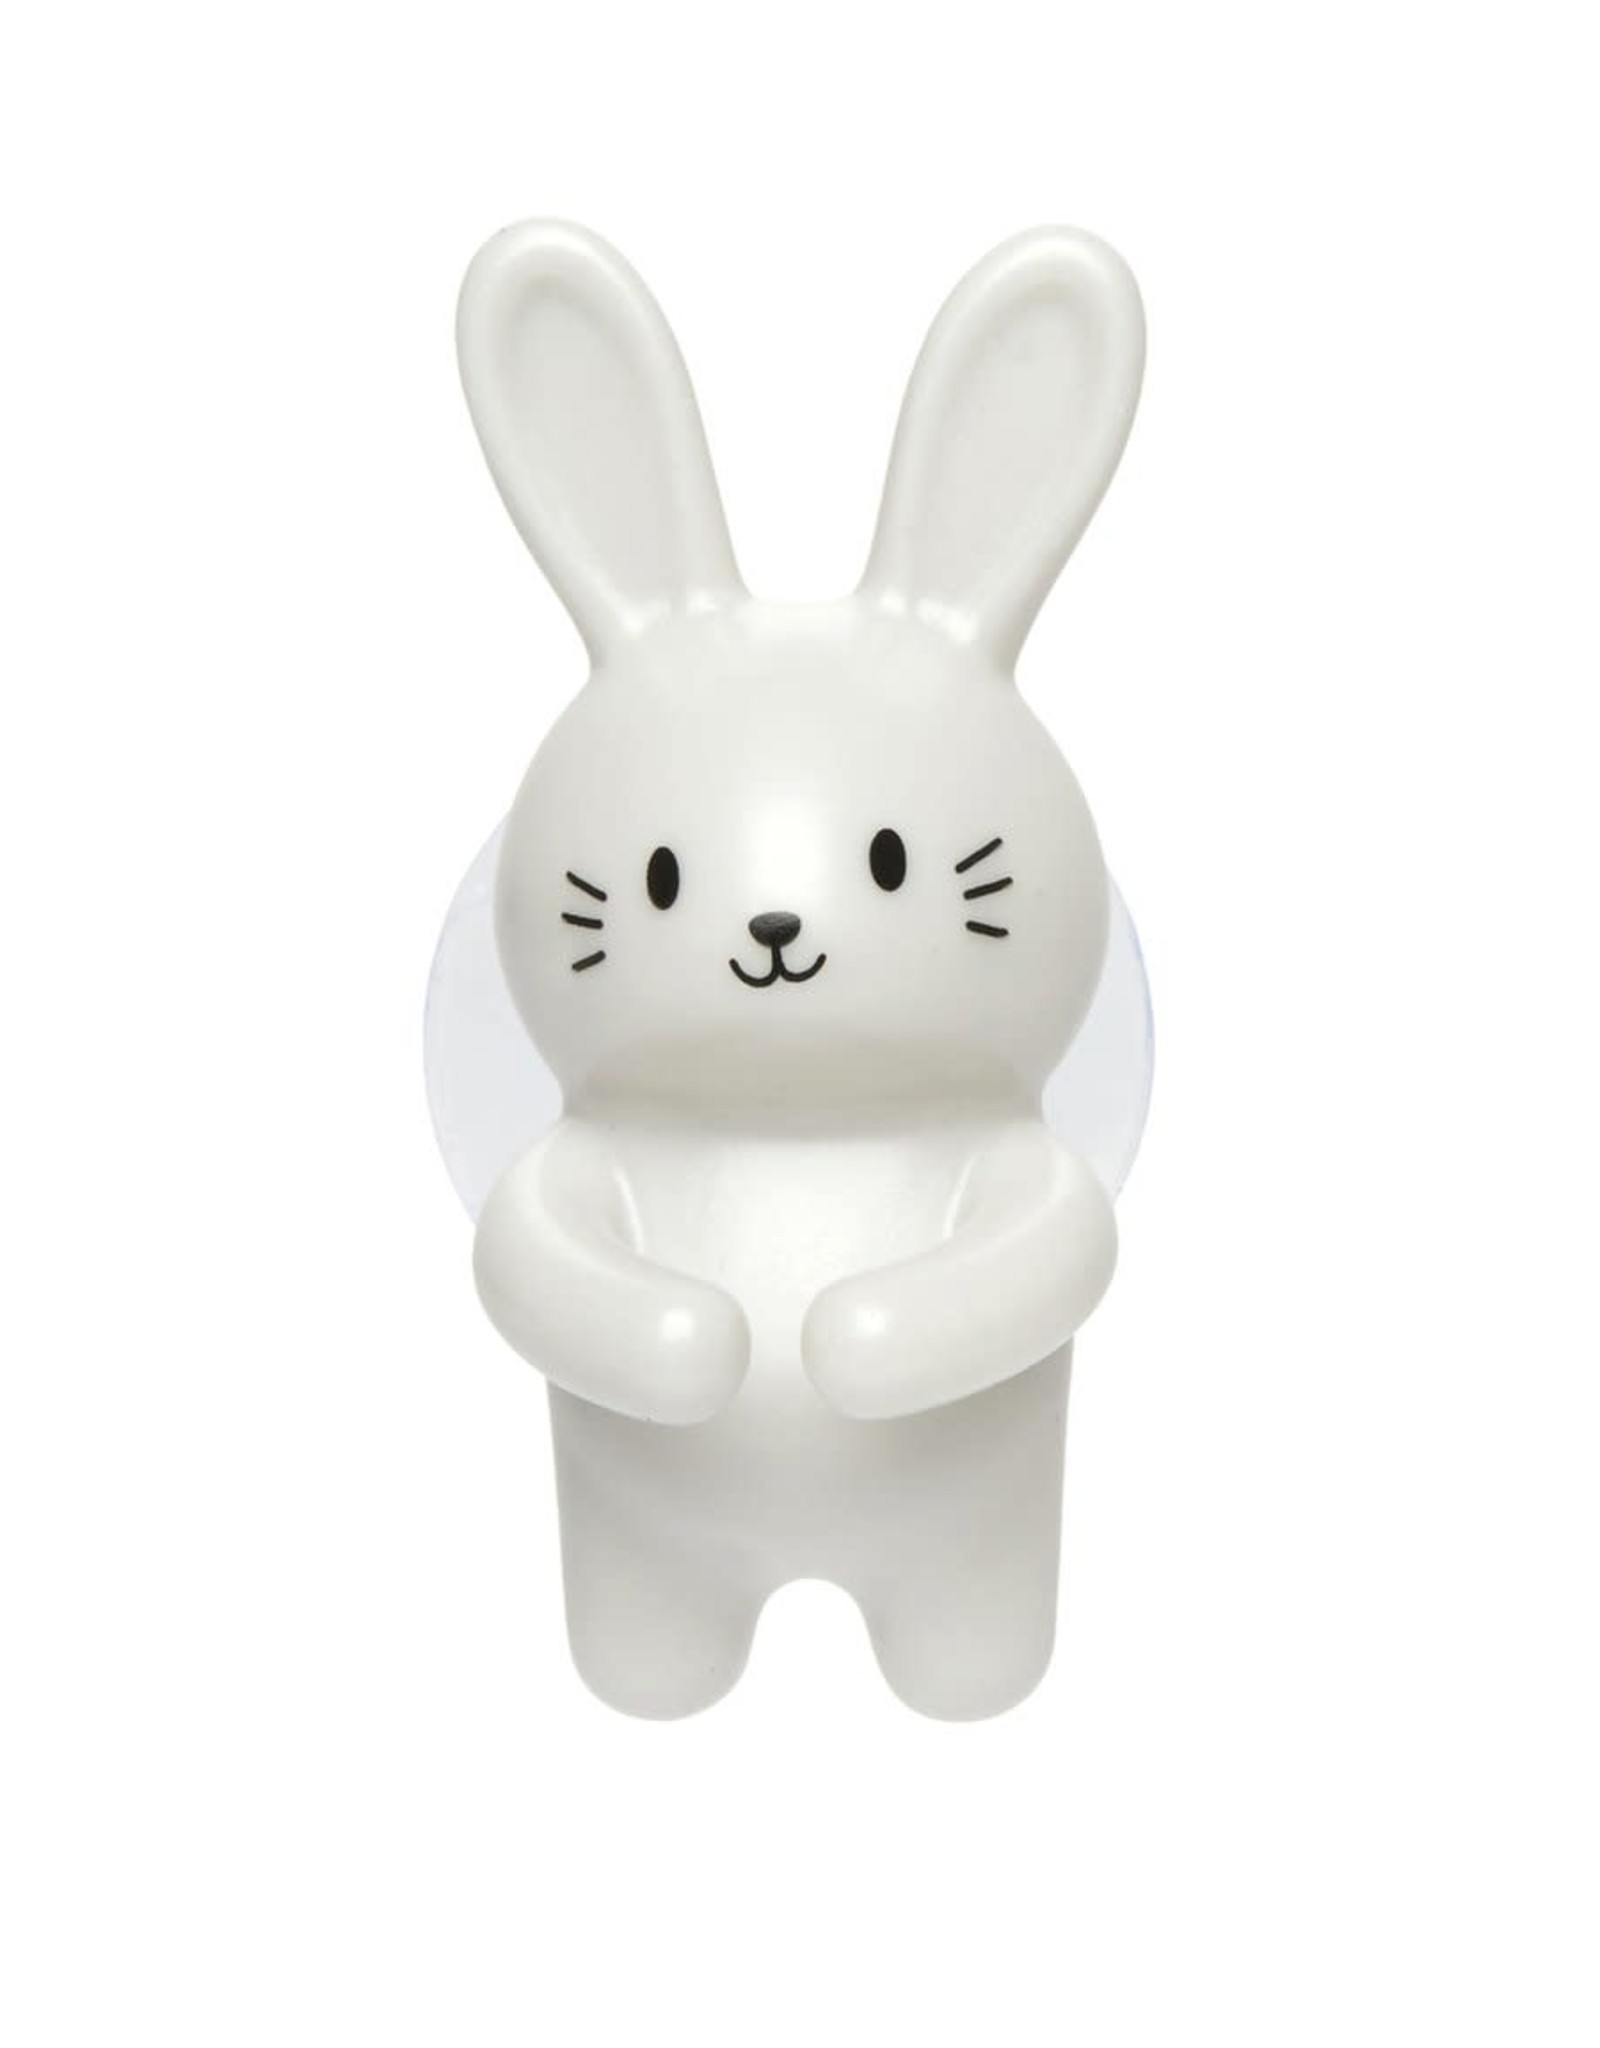 Rabbit Toothbrush Holder